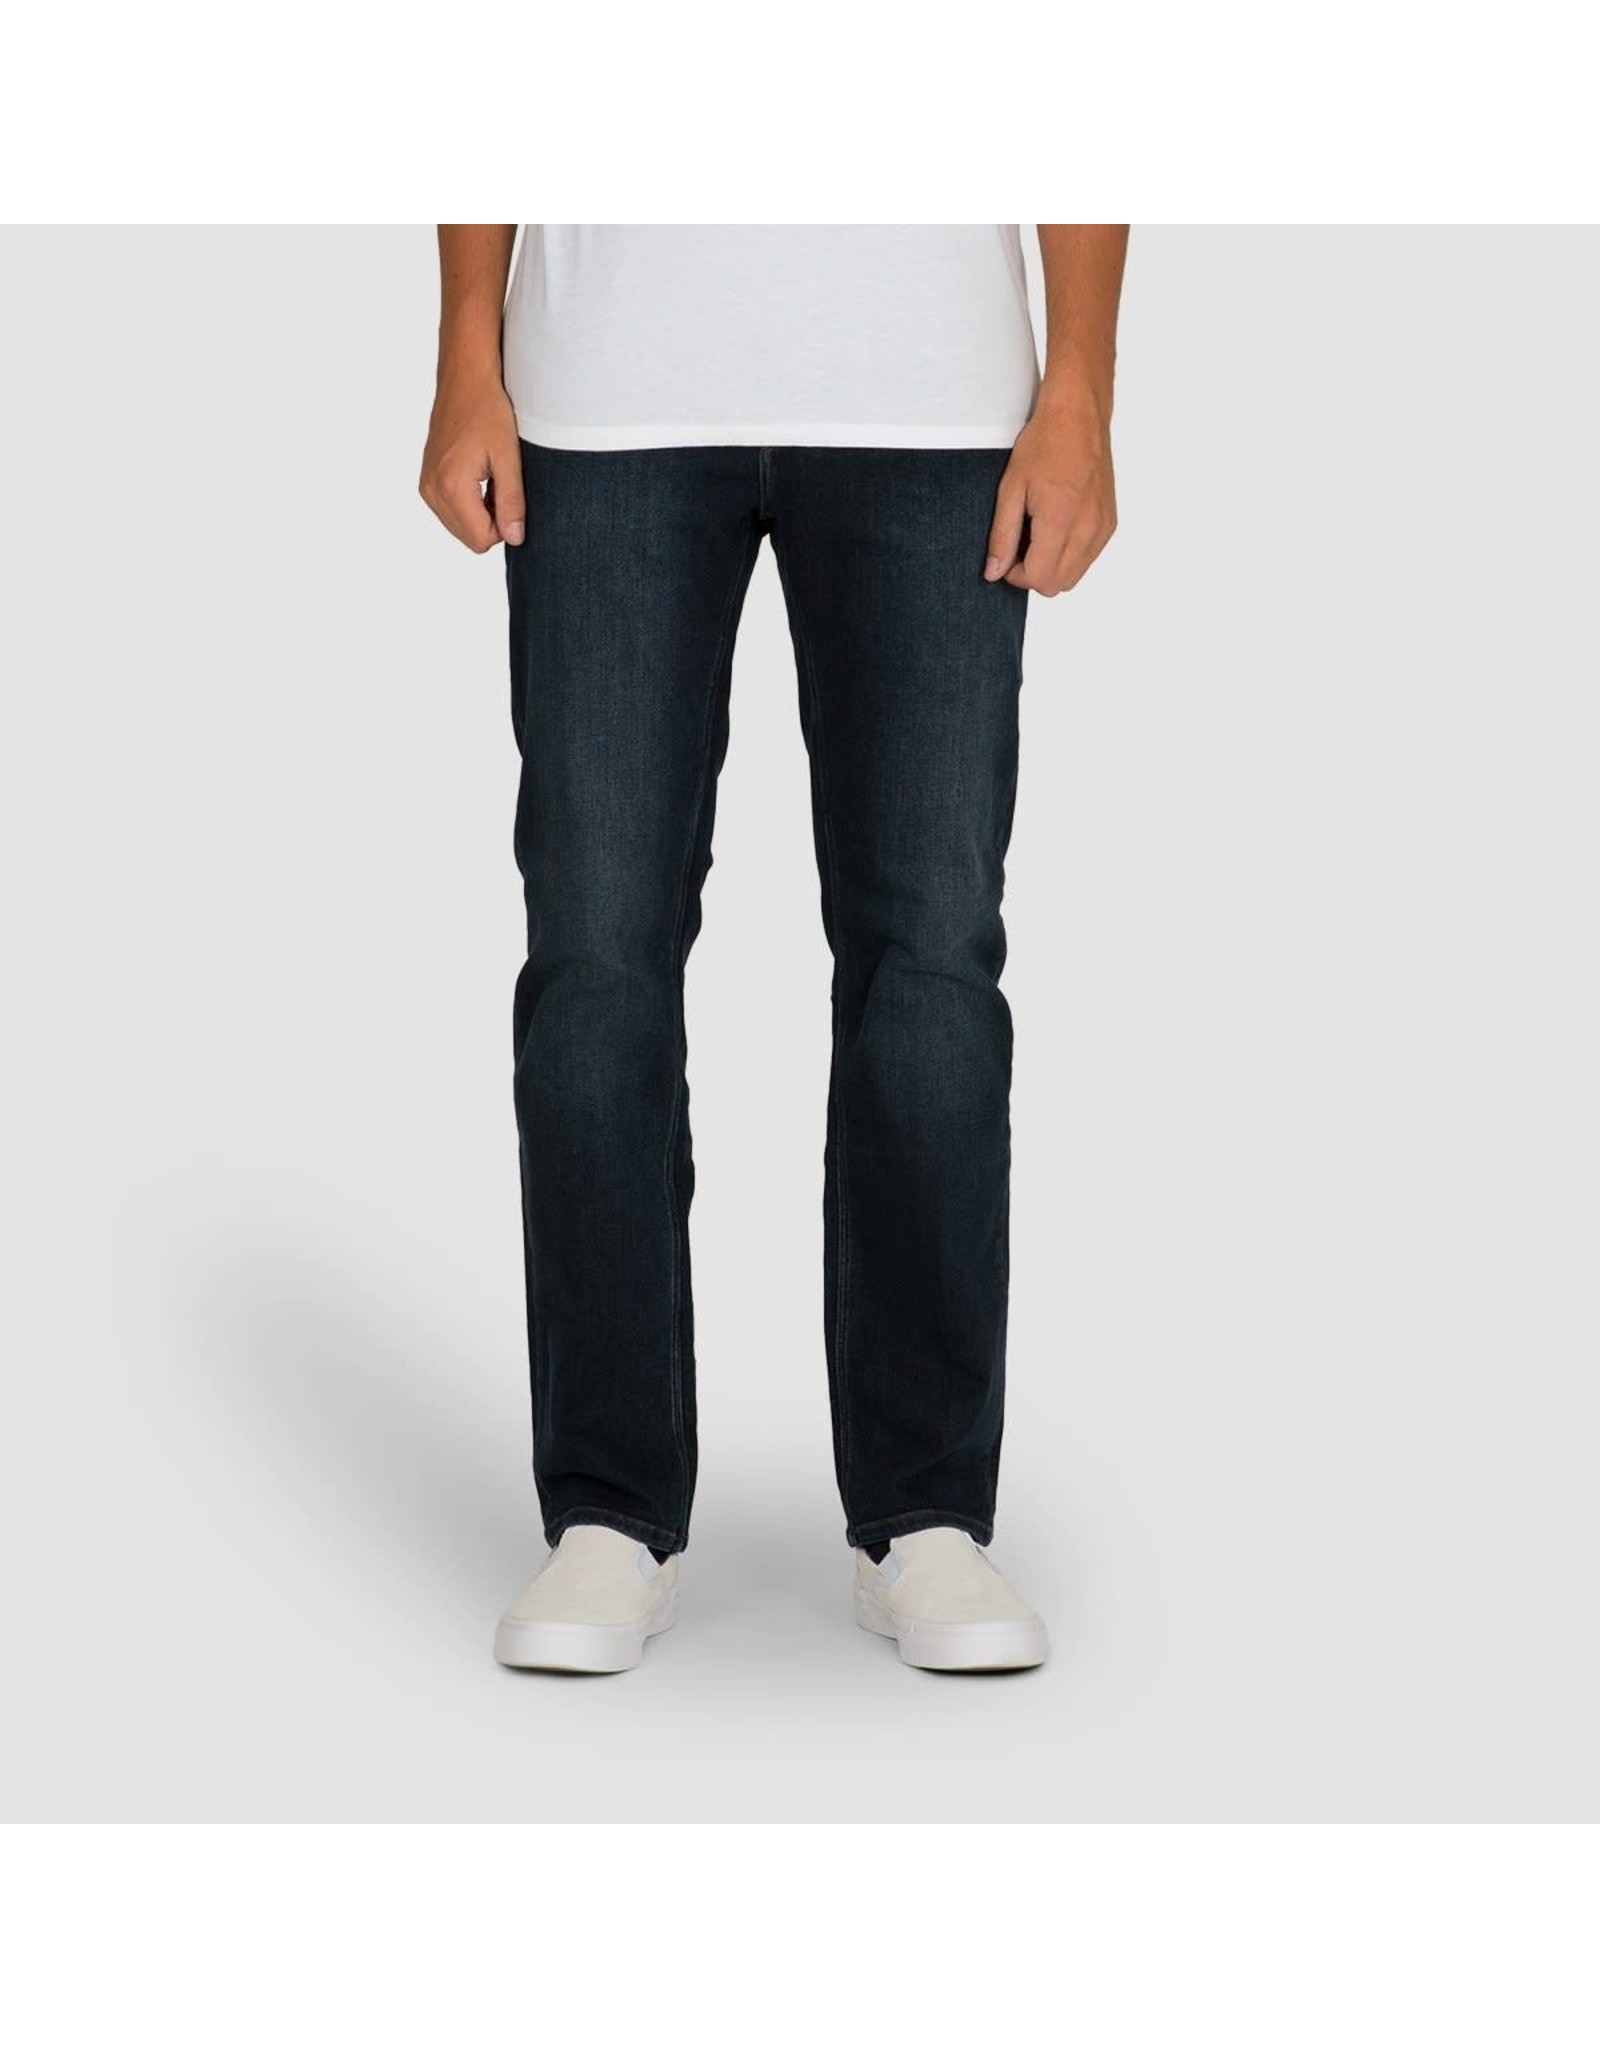 volcom Volcom - jeans solver /16 VBL/SVI